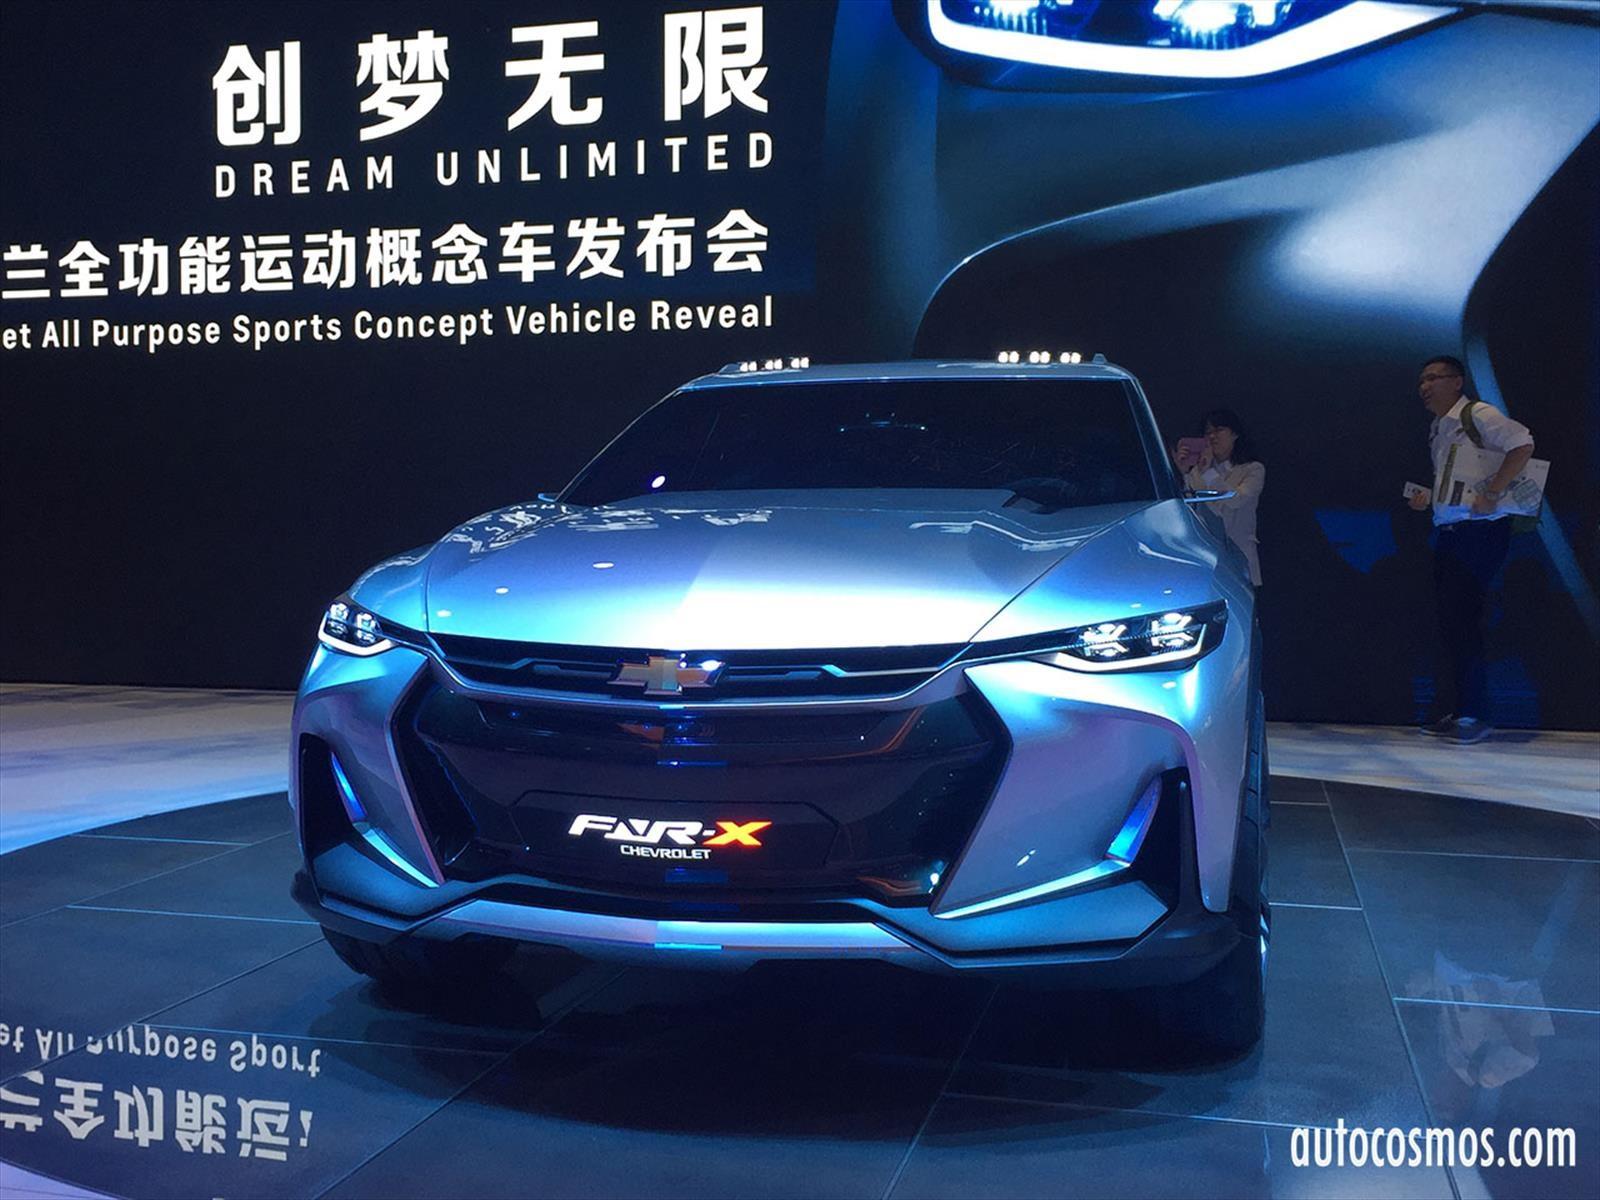 Chevrolet Fnr X Concept Noticias The Electric Car